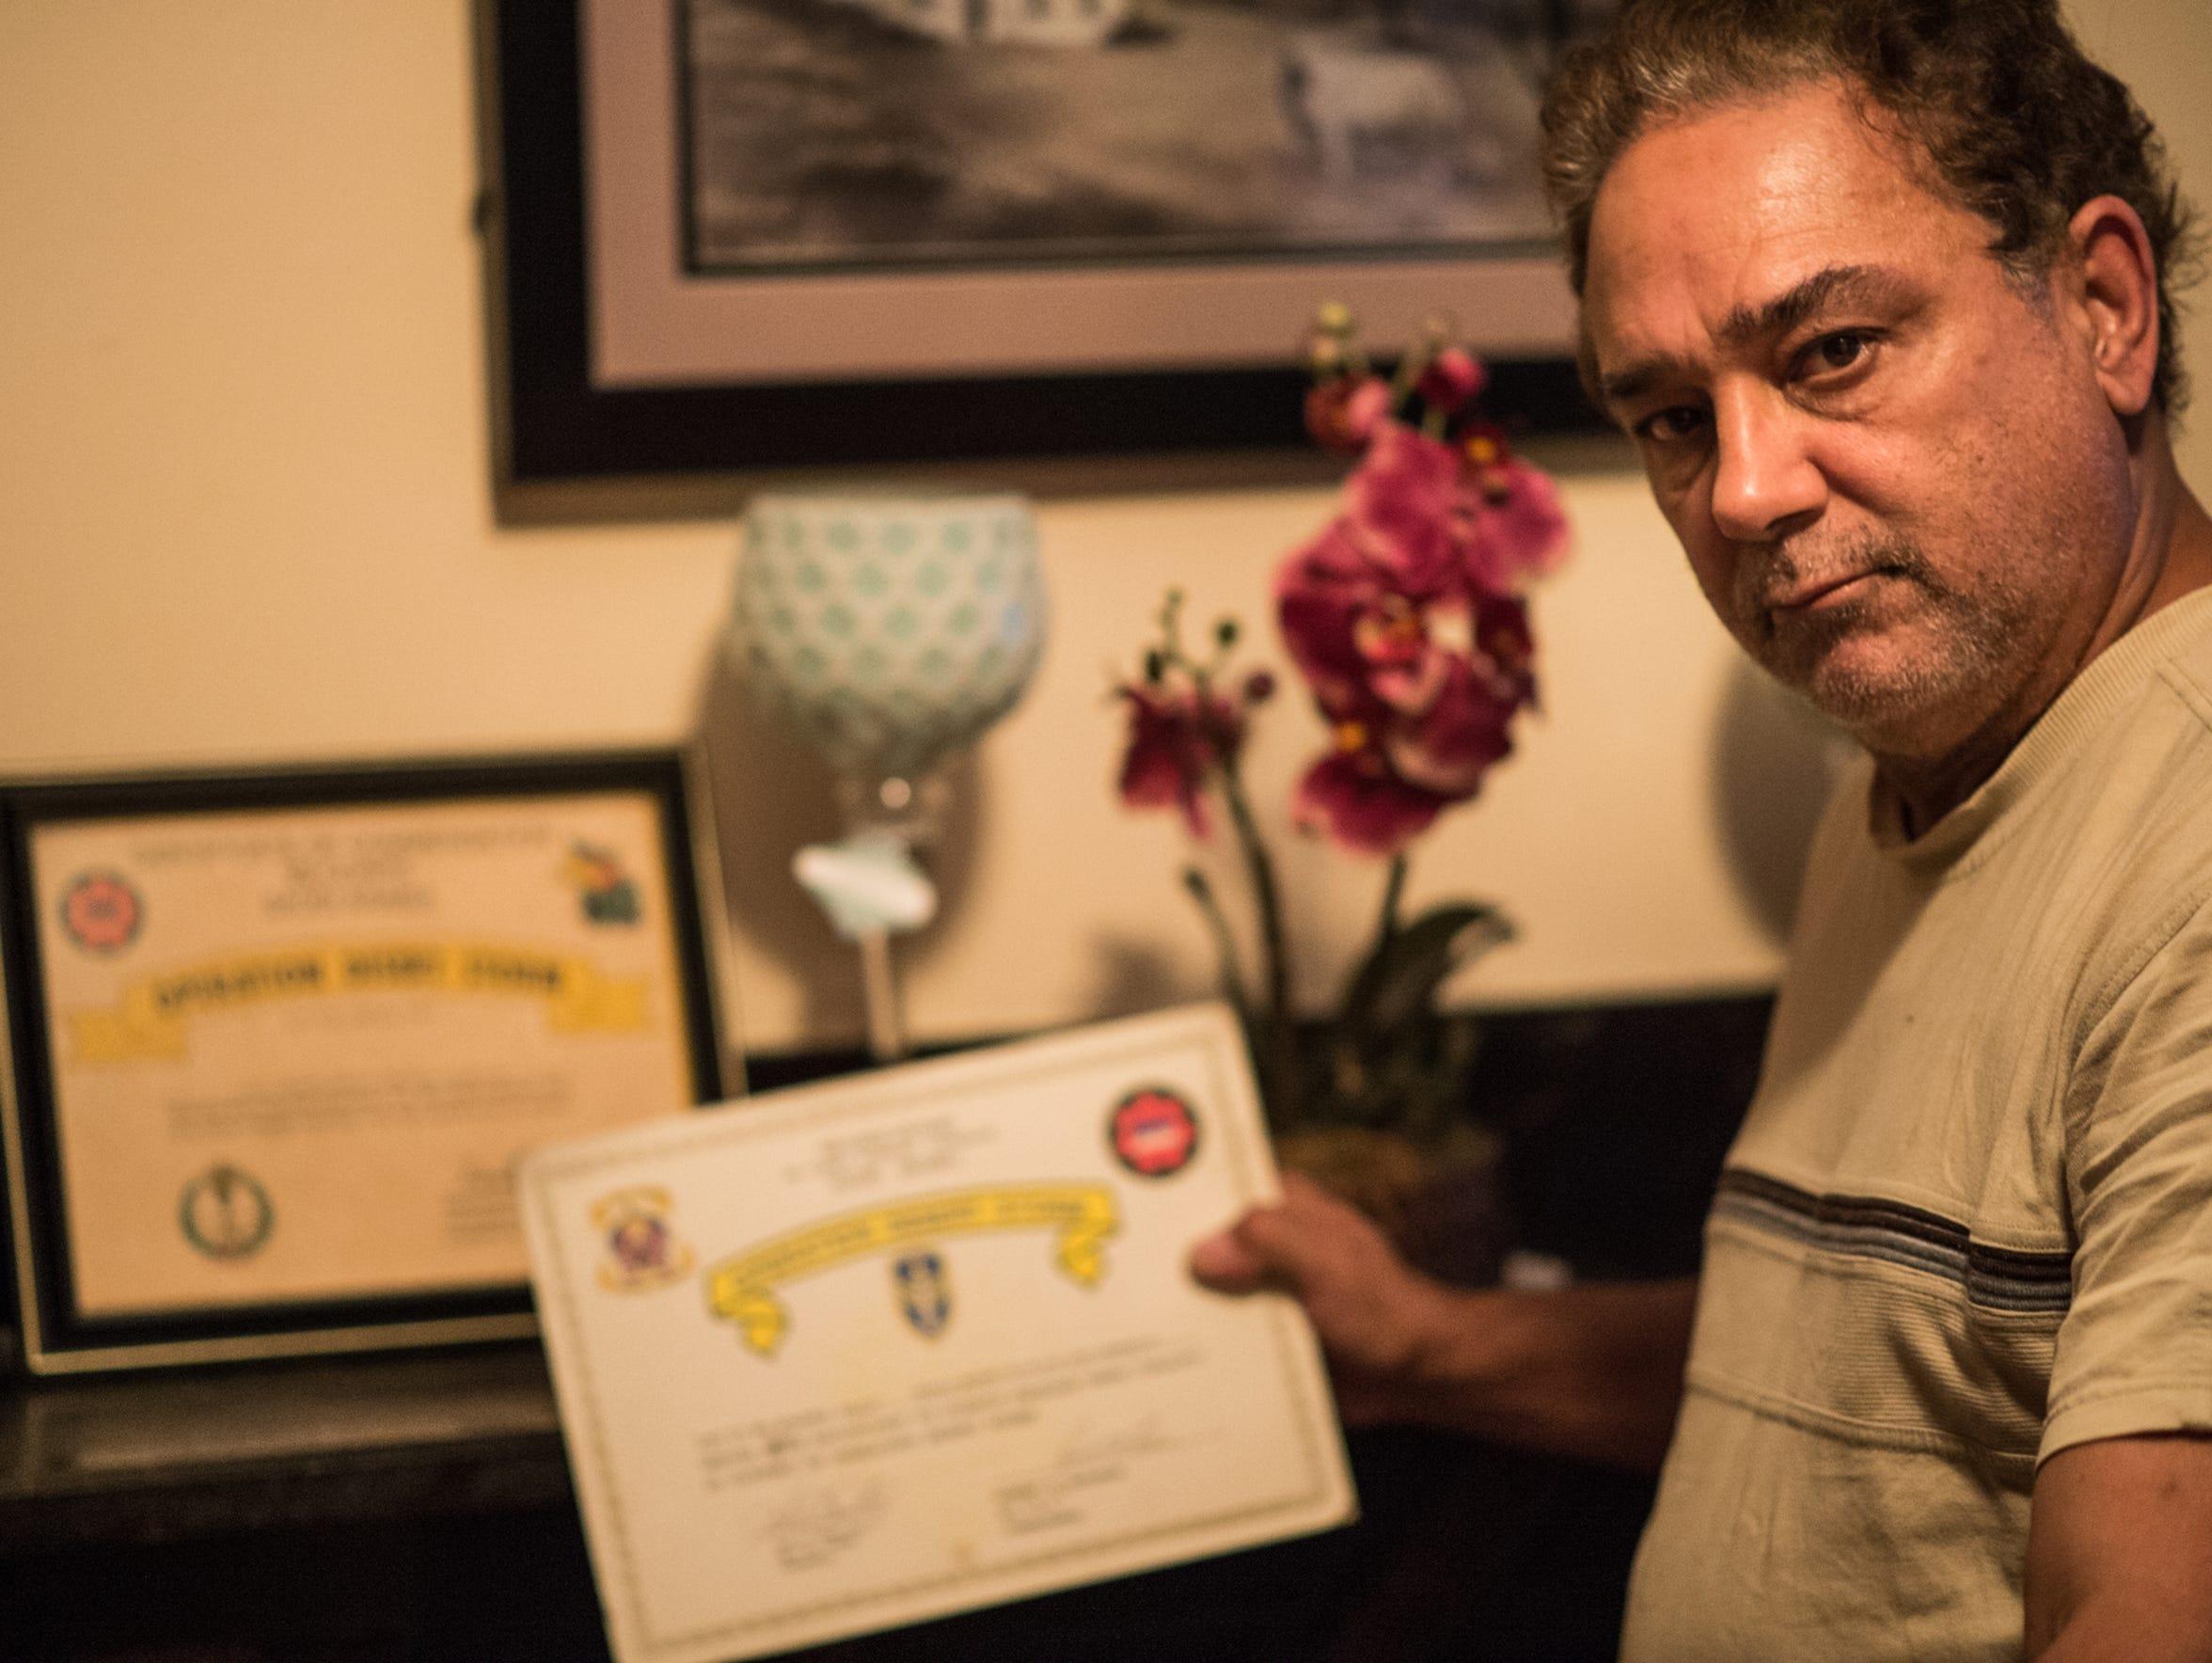 Arquelio Martinez, was a staff sergeant in Army National